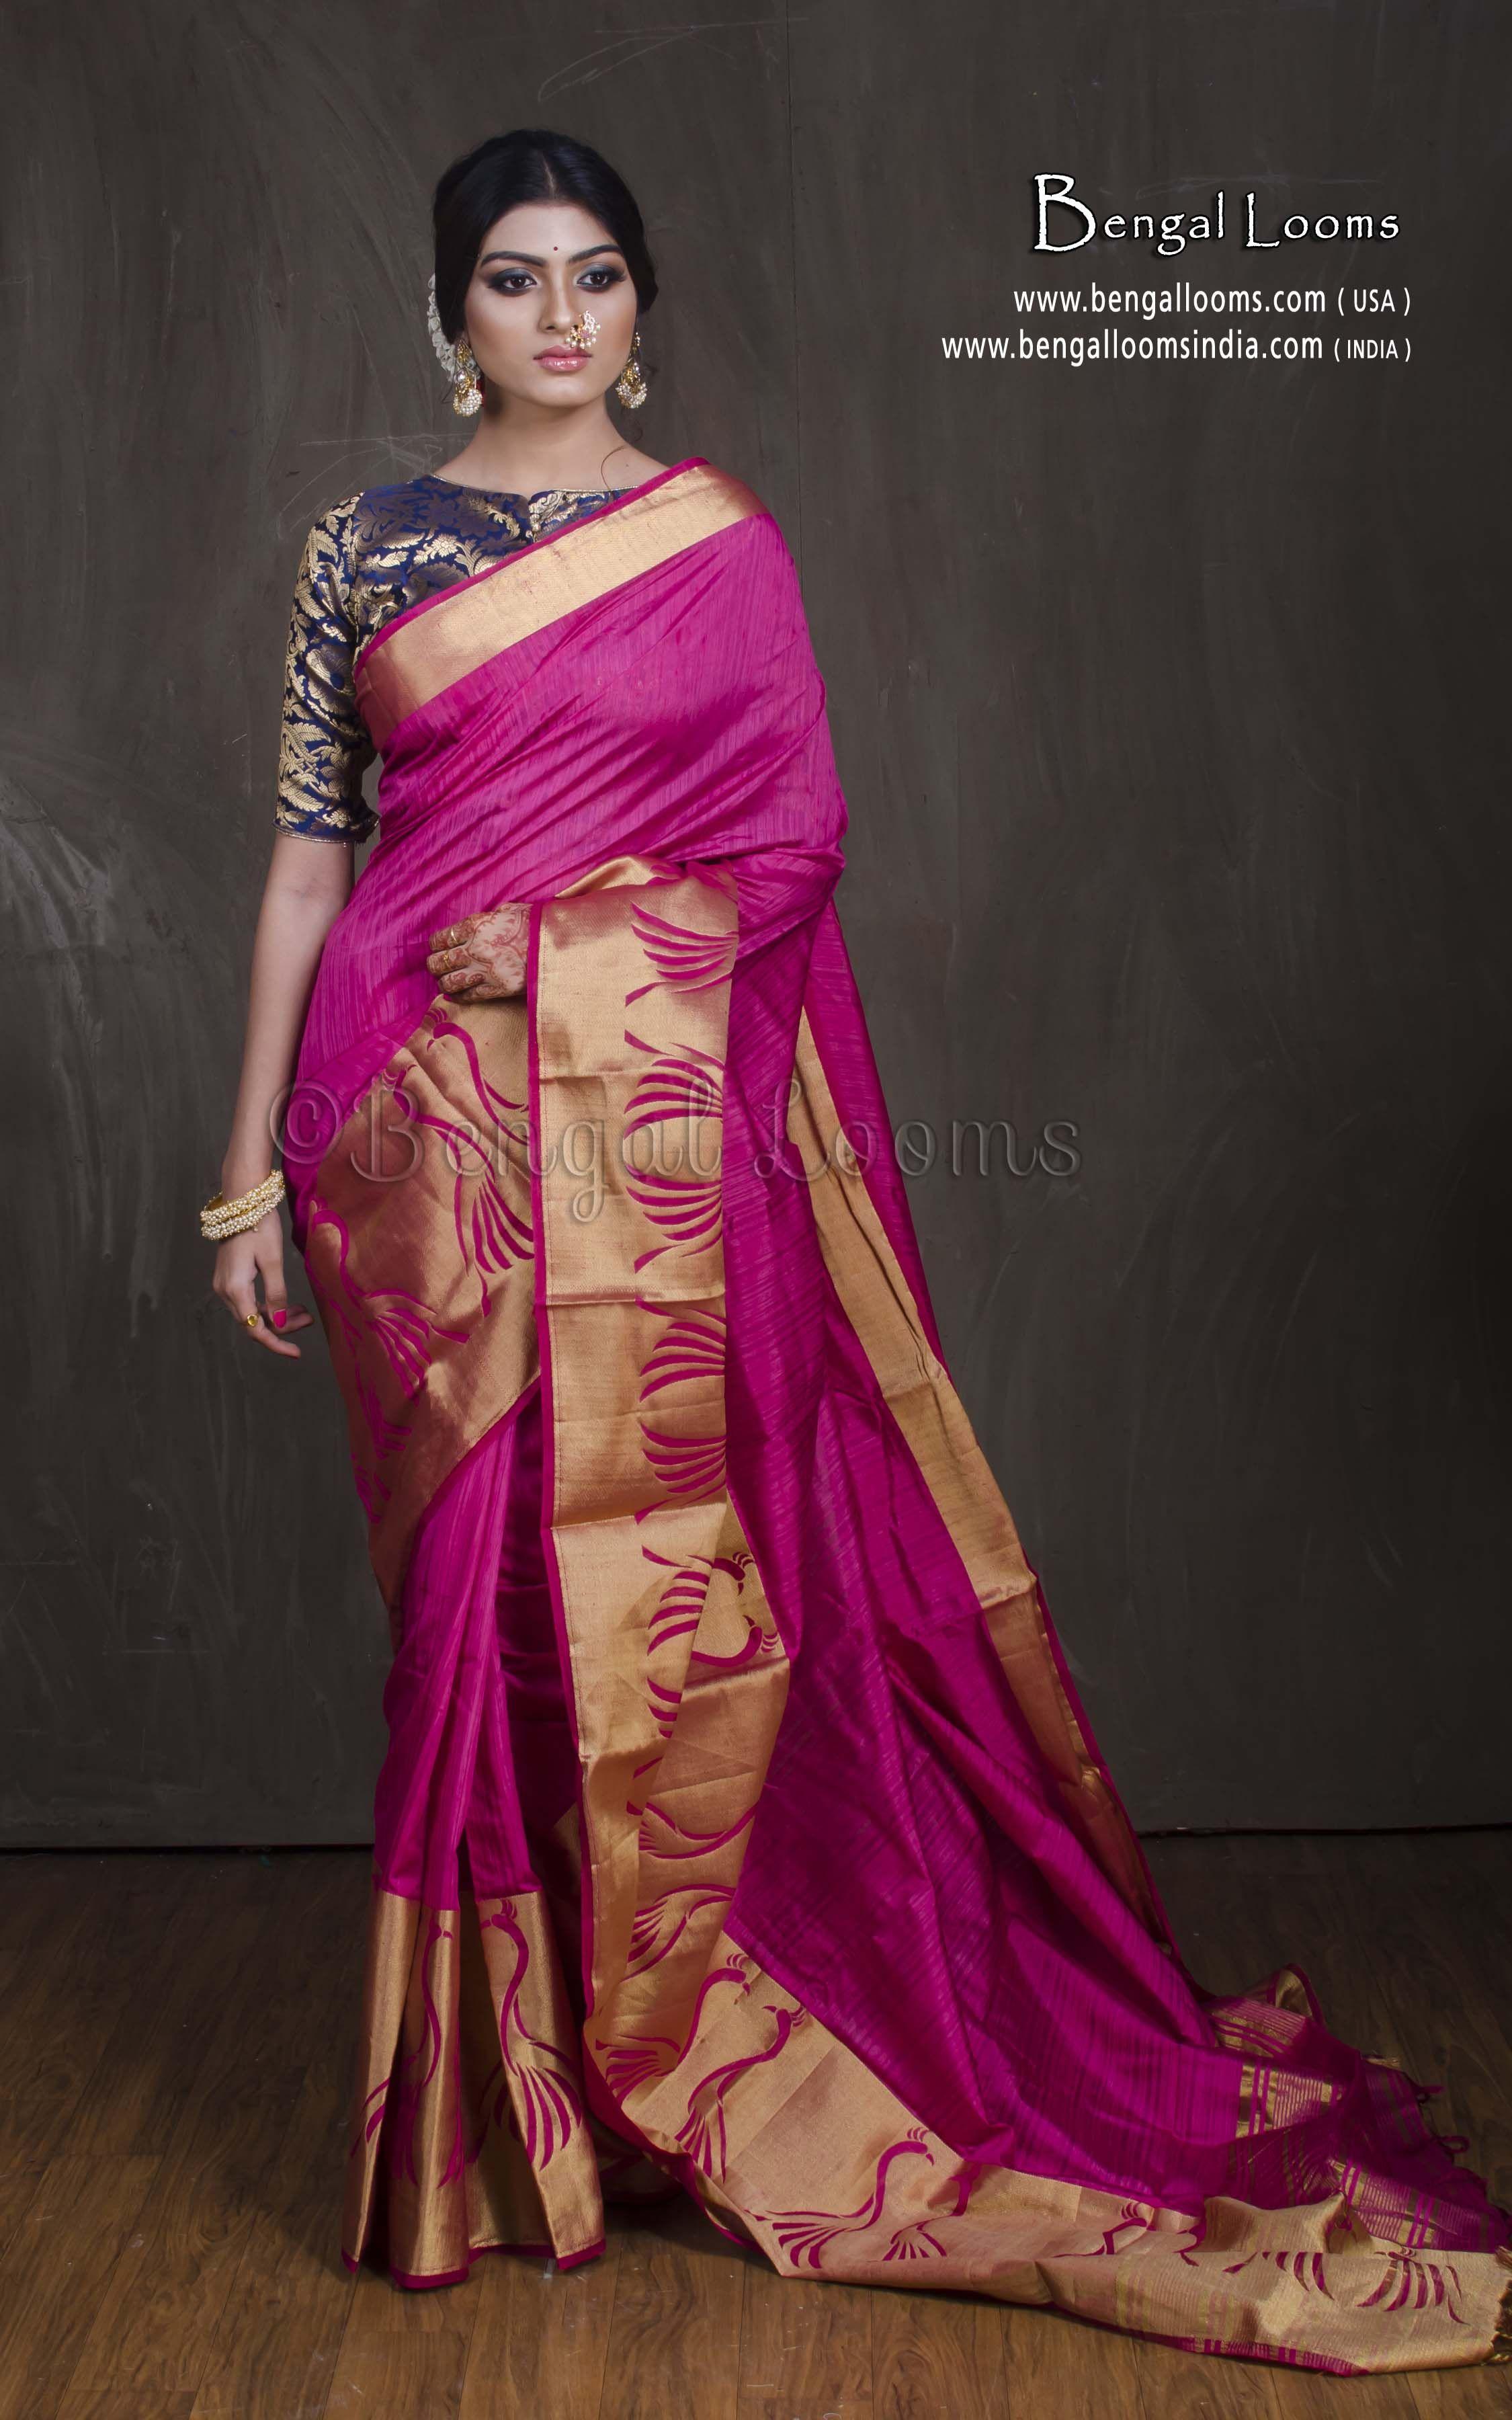 82e3ce27bcc Art Silk Kanjivaram Saree in Hot Pink and Gold. Website  -  www.bengalloomsindia.com